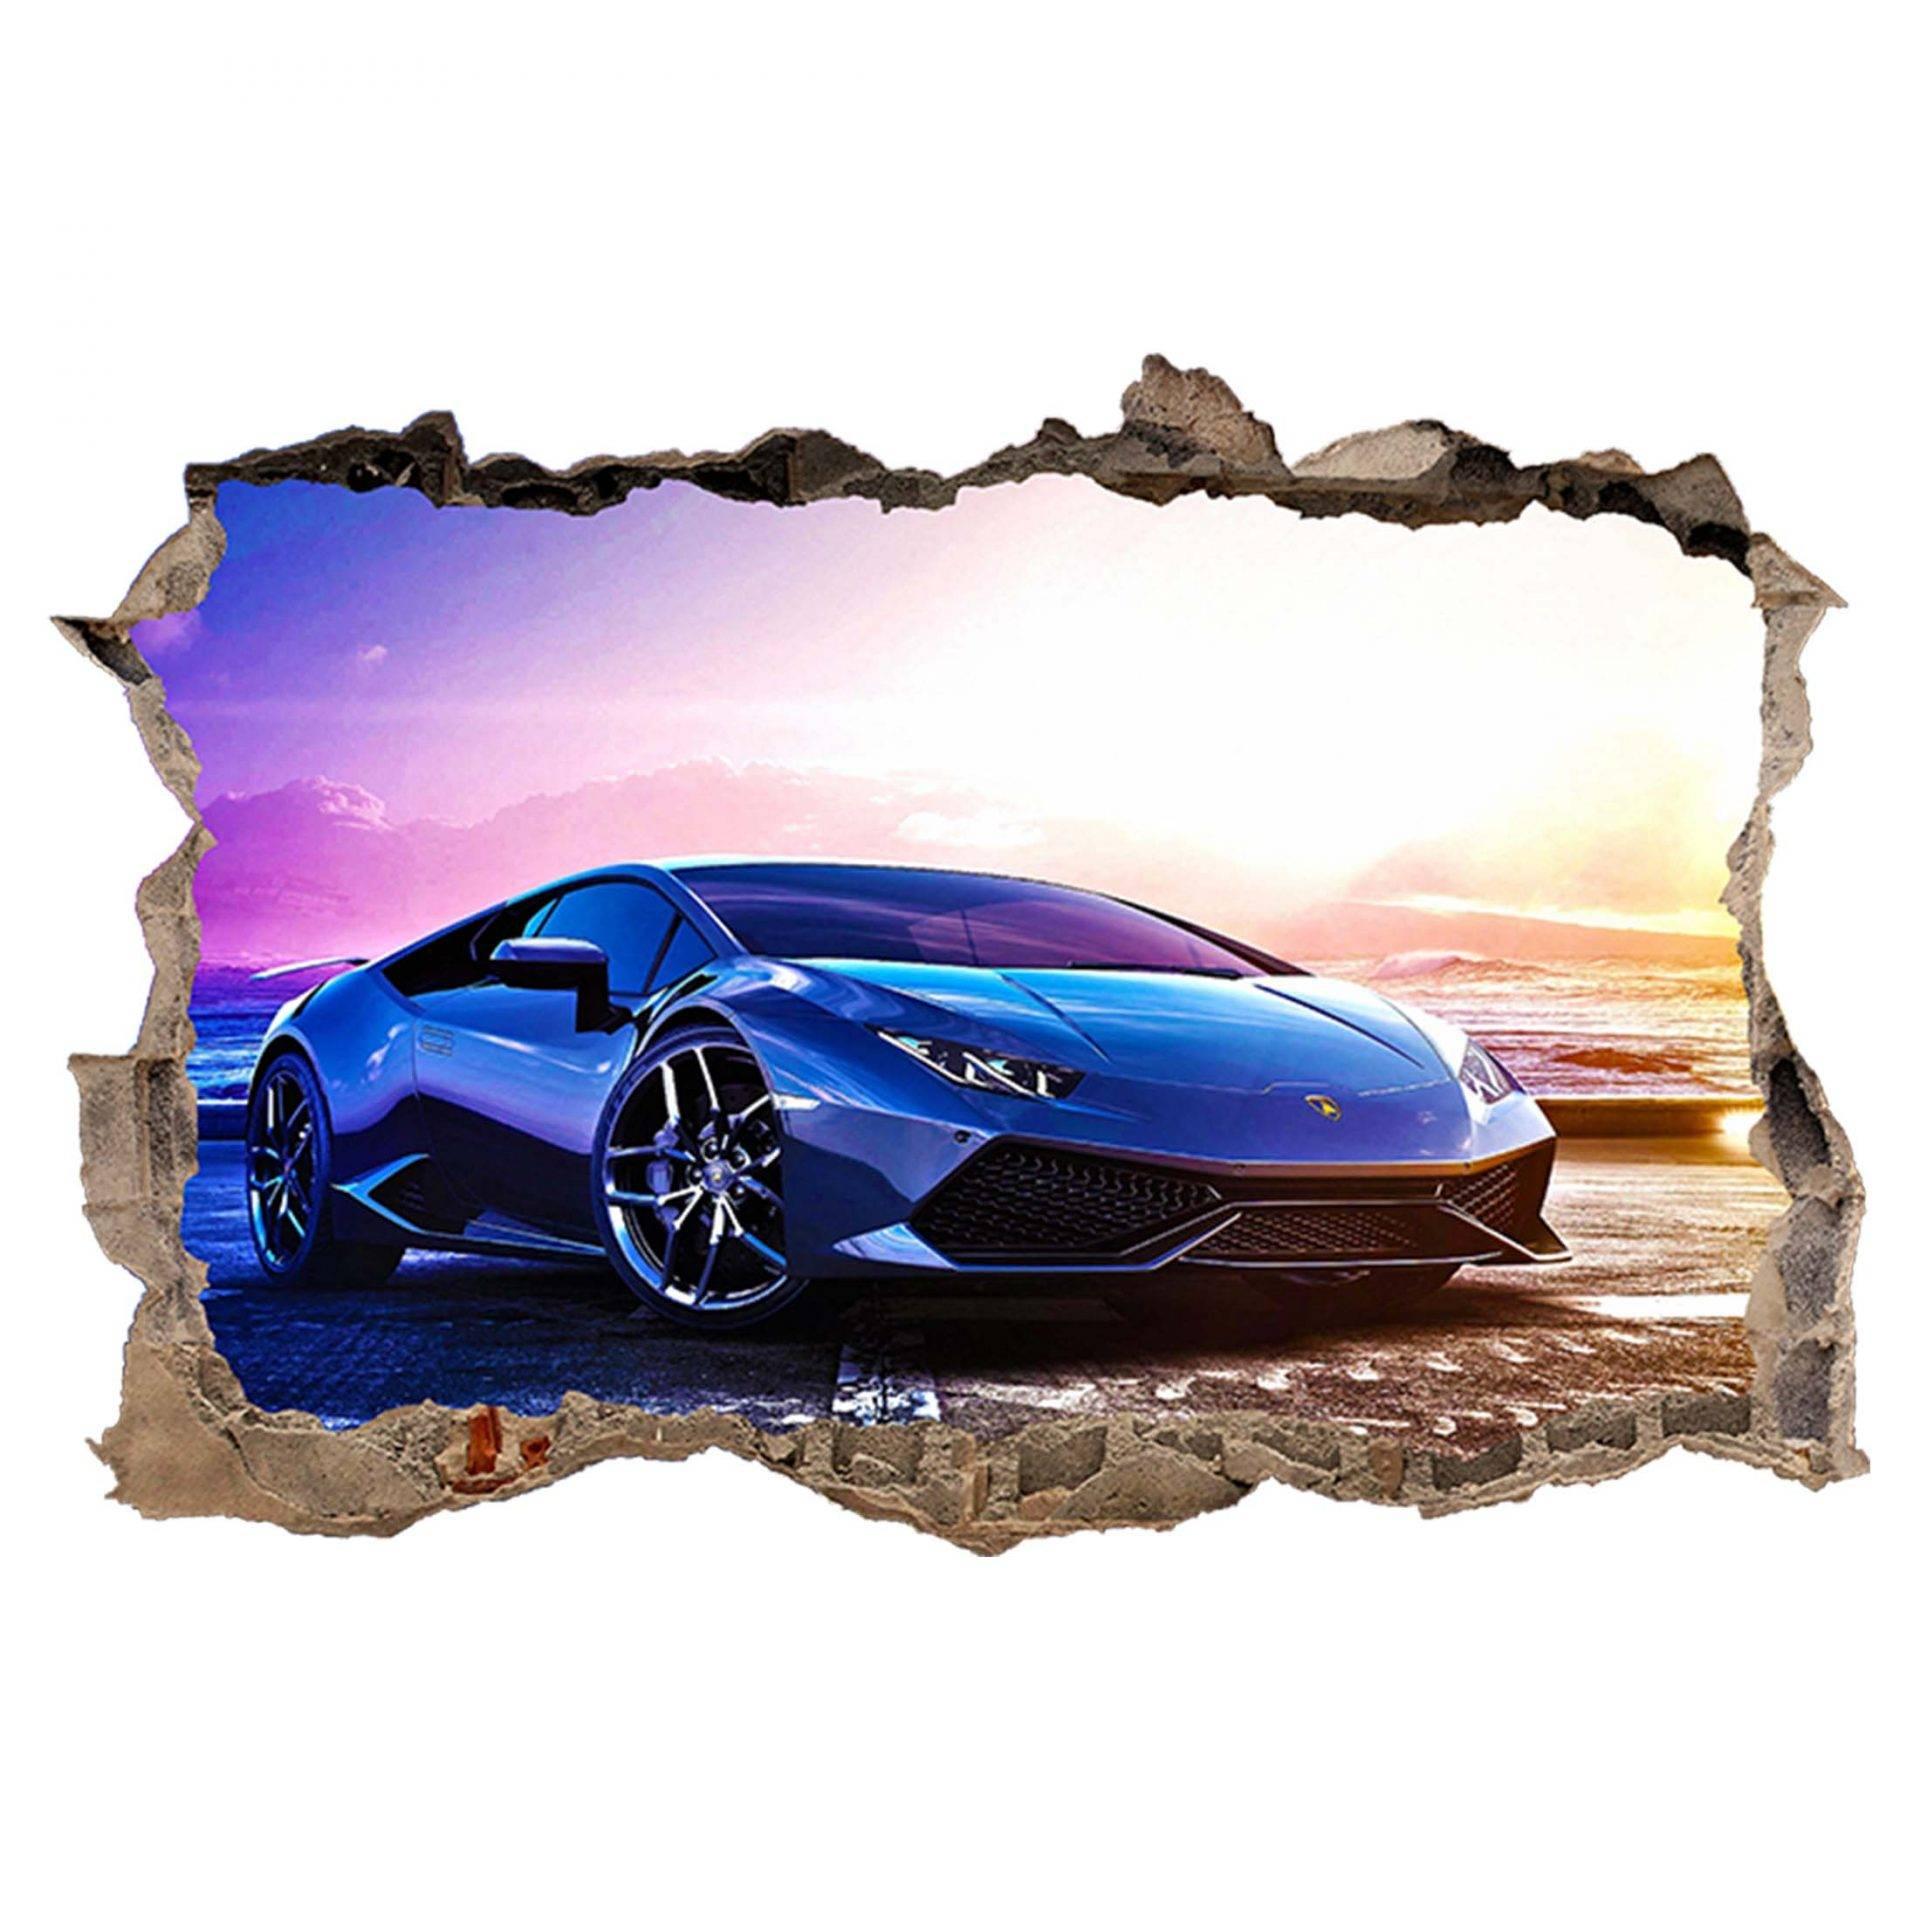 Lamborghini Aventador 3D Torn Hole Ripped Wall Sticker Decal Art Race Car WT237